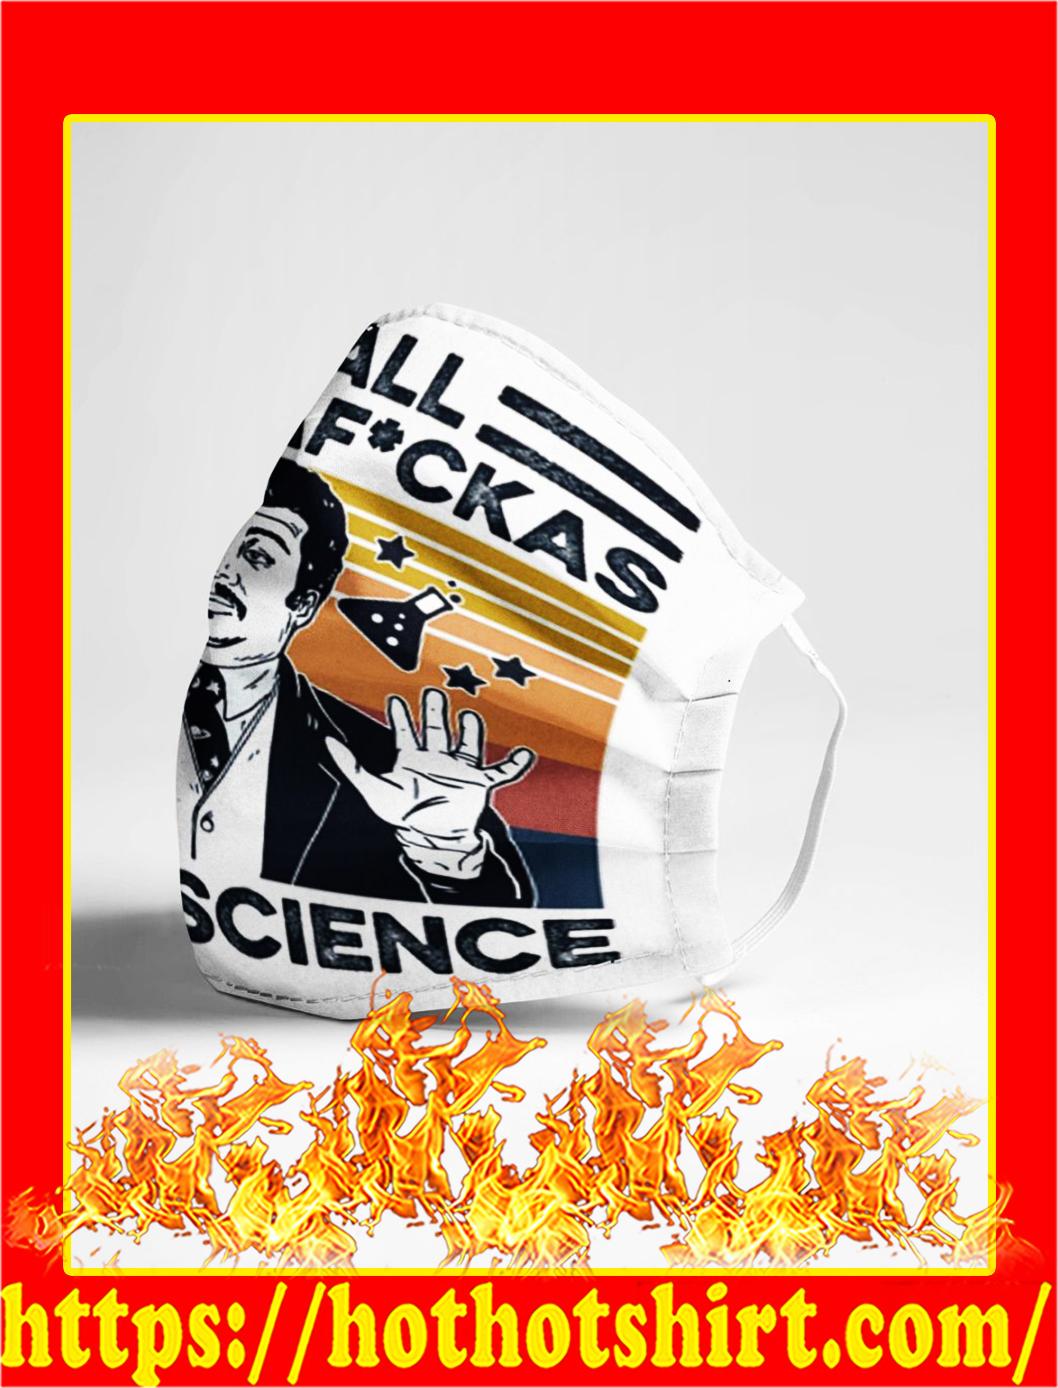 Y'all mothafuckas need science face mask- pic 1